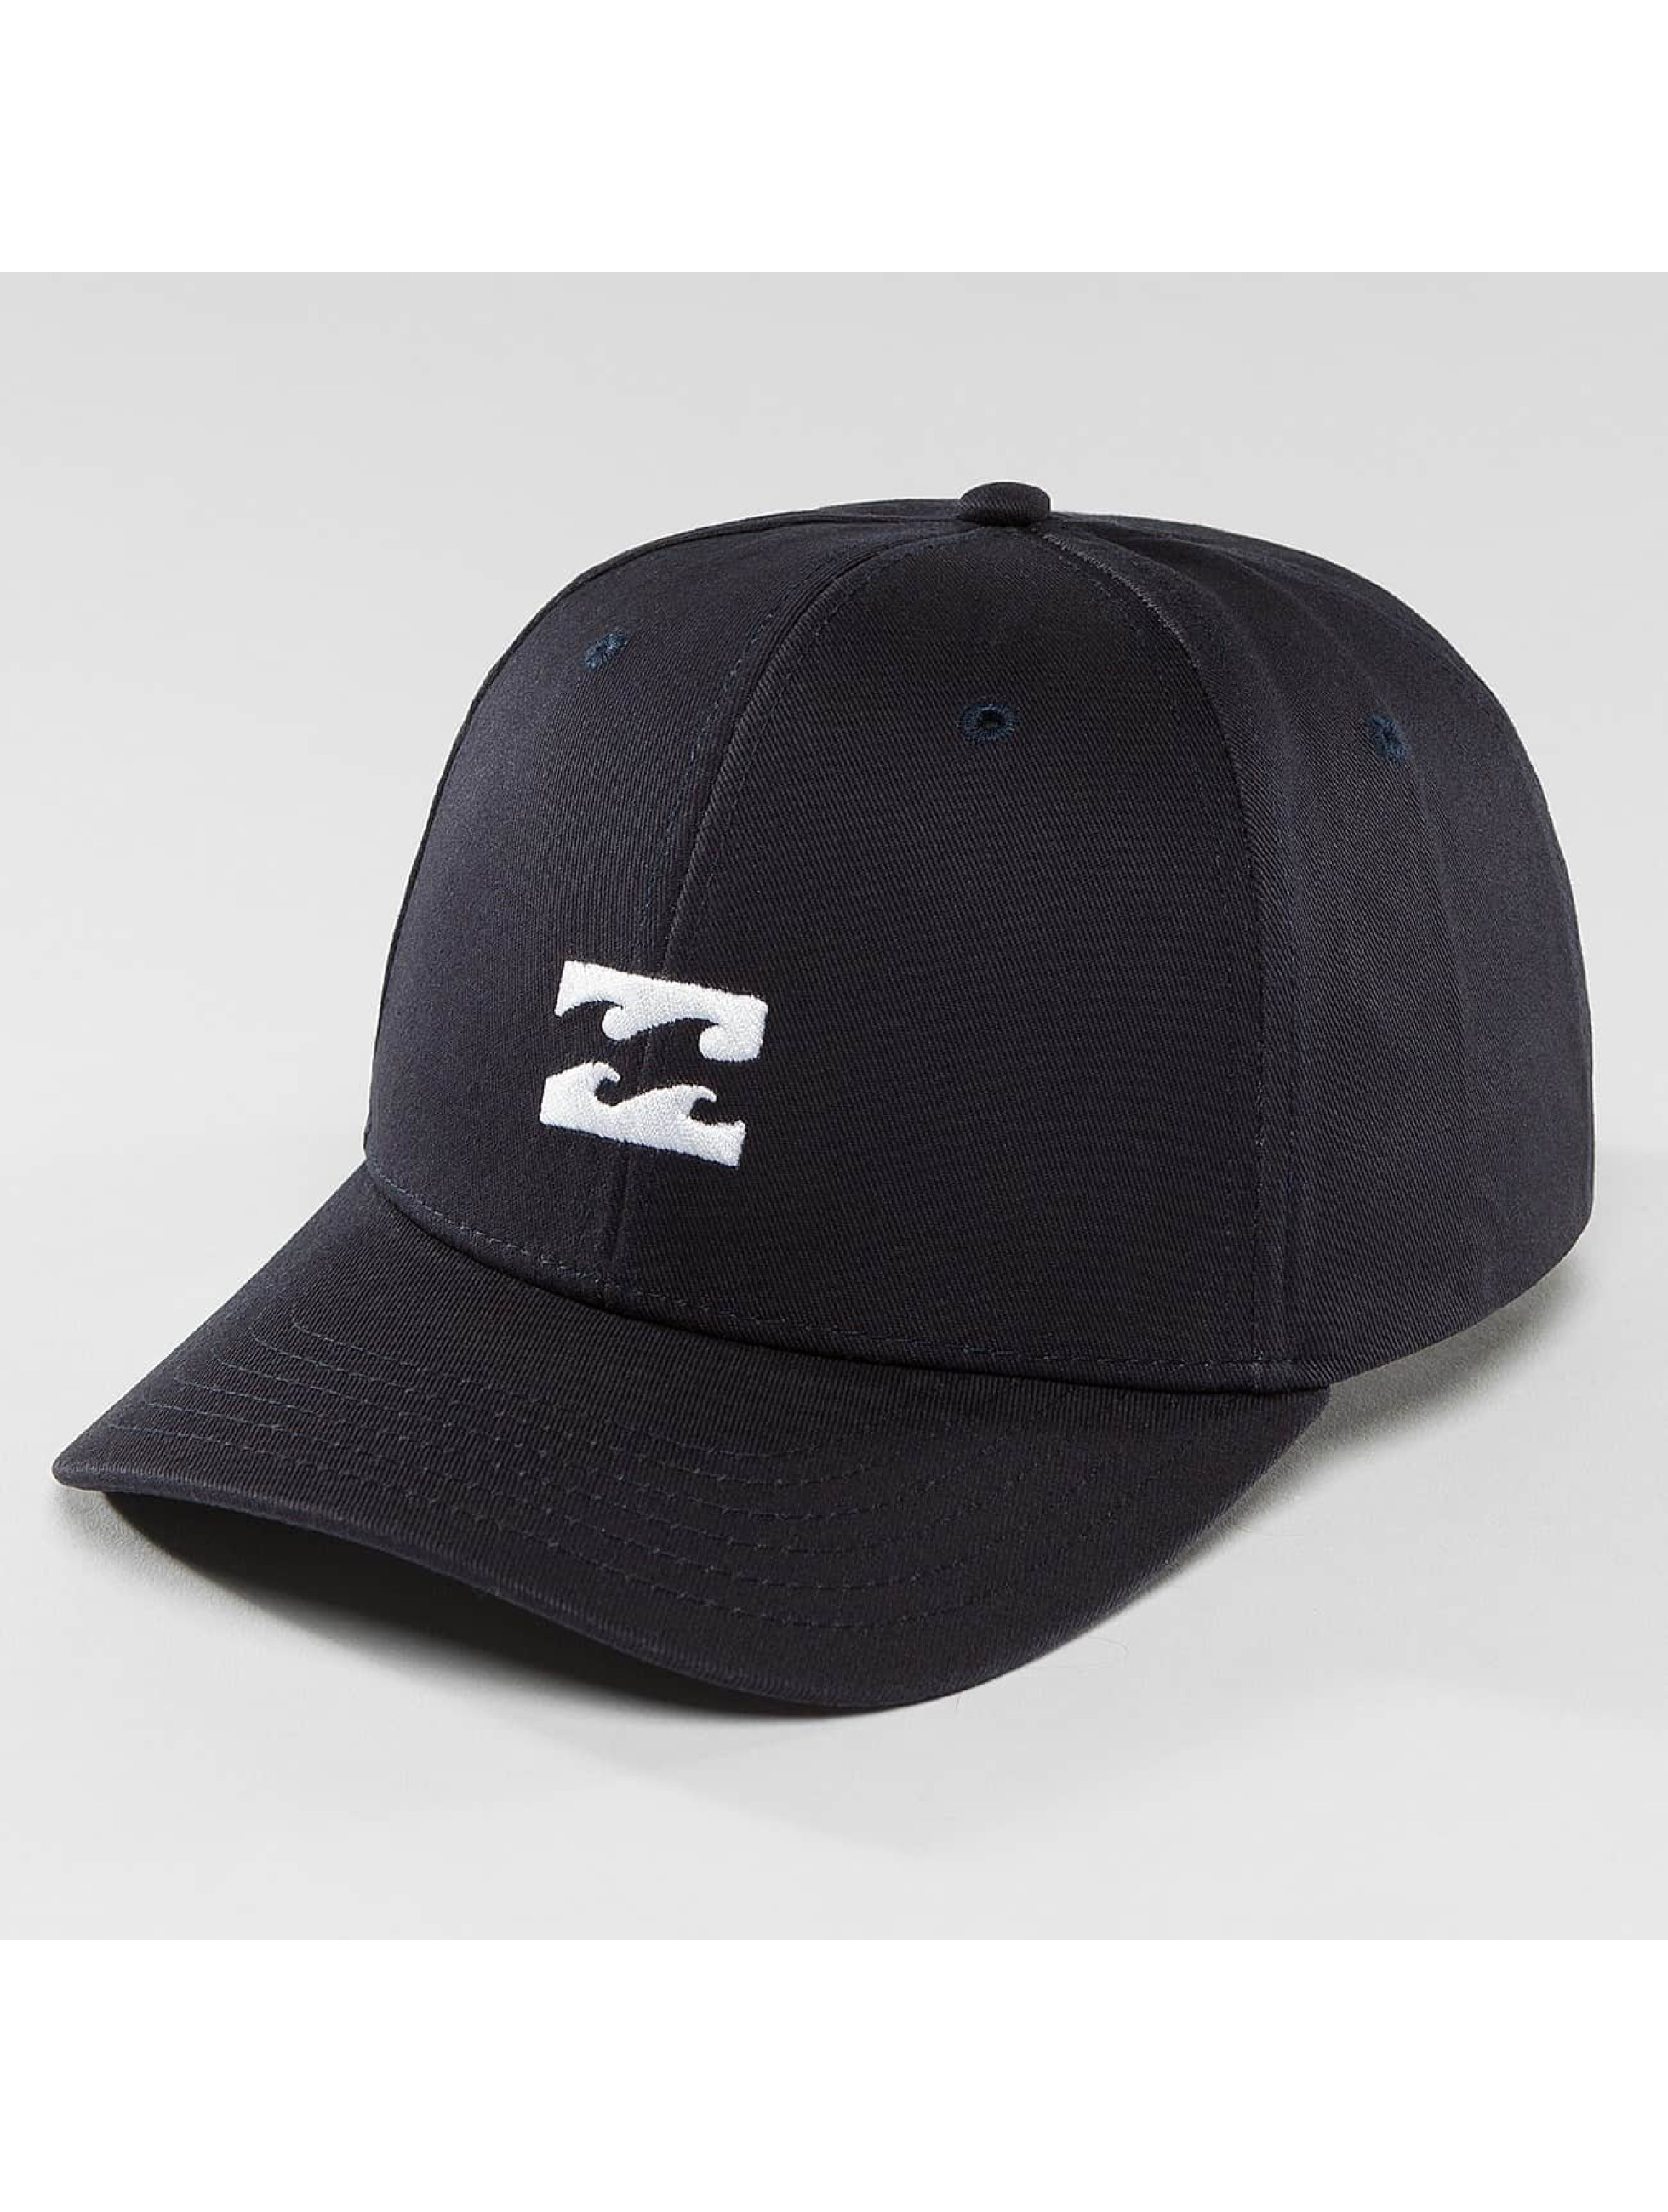 Billabong Herren Caps   Snapback Cap Emblem 1 von 3Kostenloser Versand ... c47f88394912